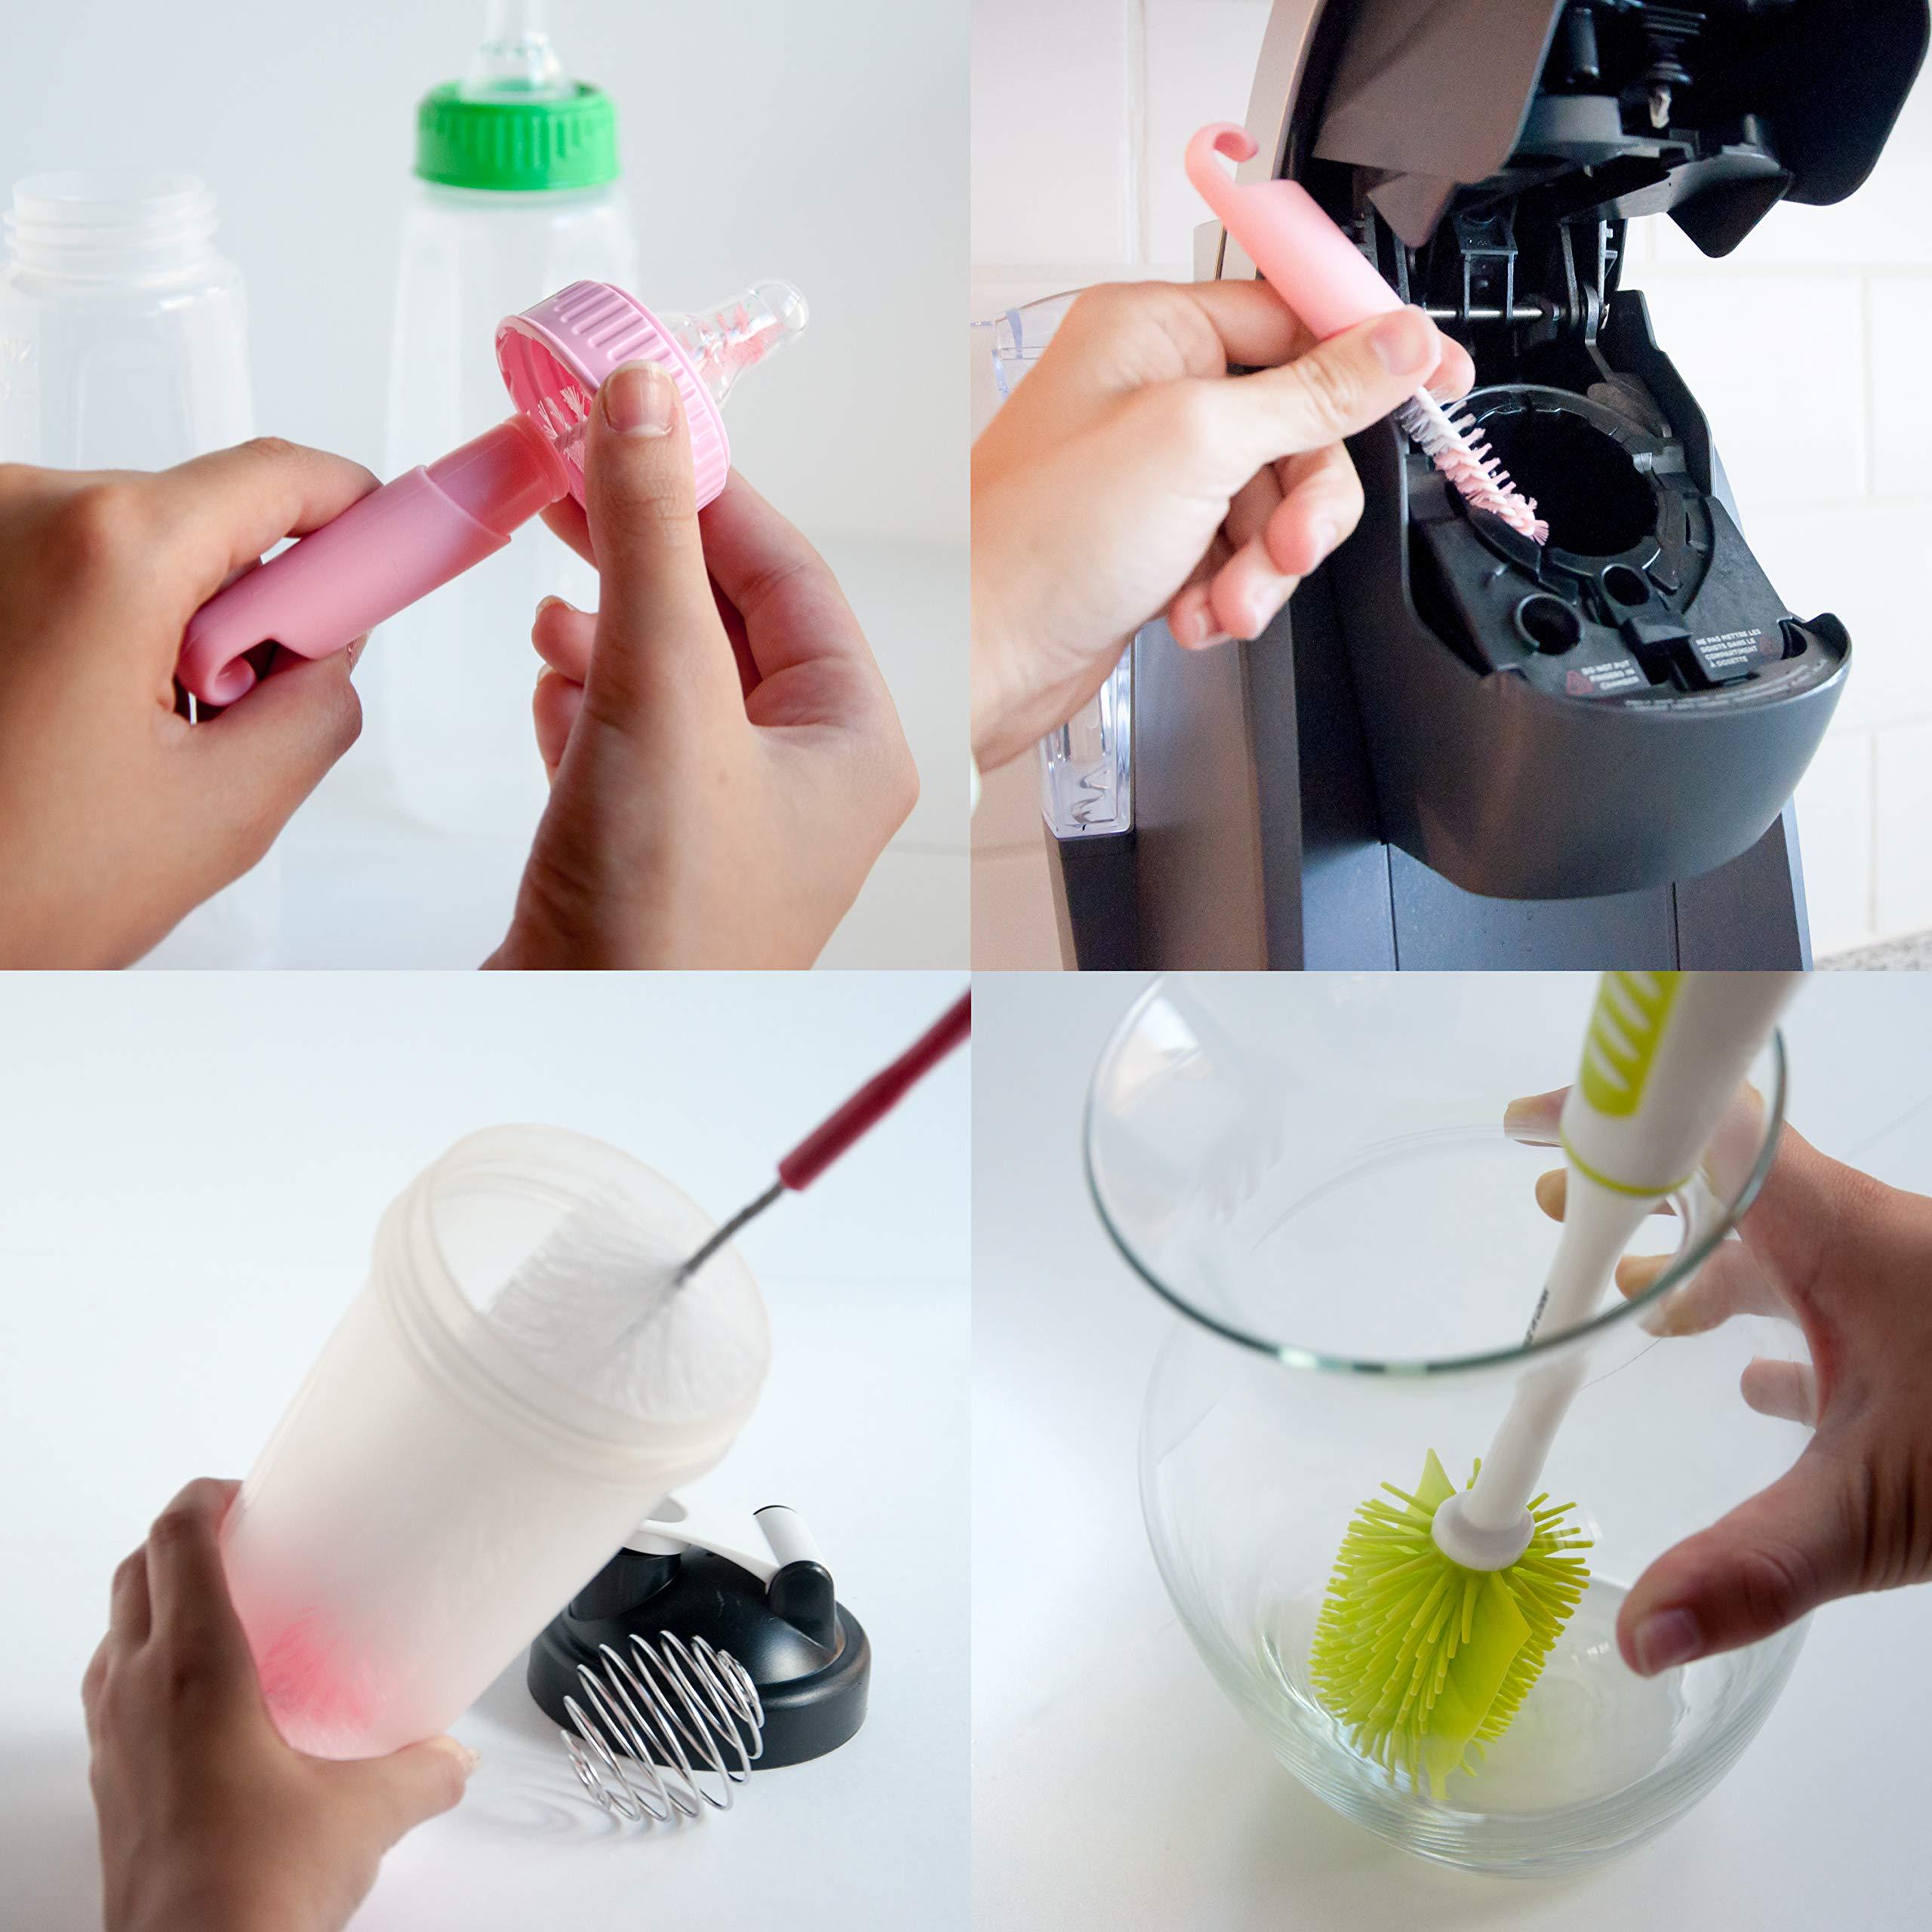 Bottle Brushes for Cleaning - 4 Pcs of Silicone and Vinyl Tube Bottle Brush Set | Nipple Cleaning Brush, Narrow Neck Bottle Brush, Long Handle, BPA Free, Dishwasher Safe by Innovative Technology Products Corp (Image #2)